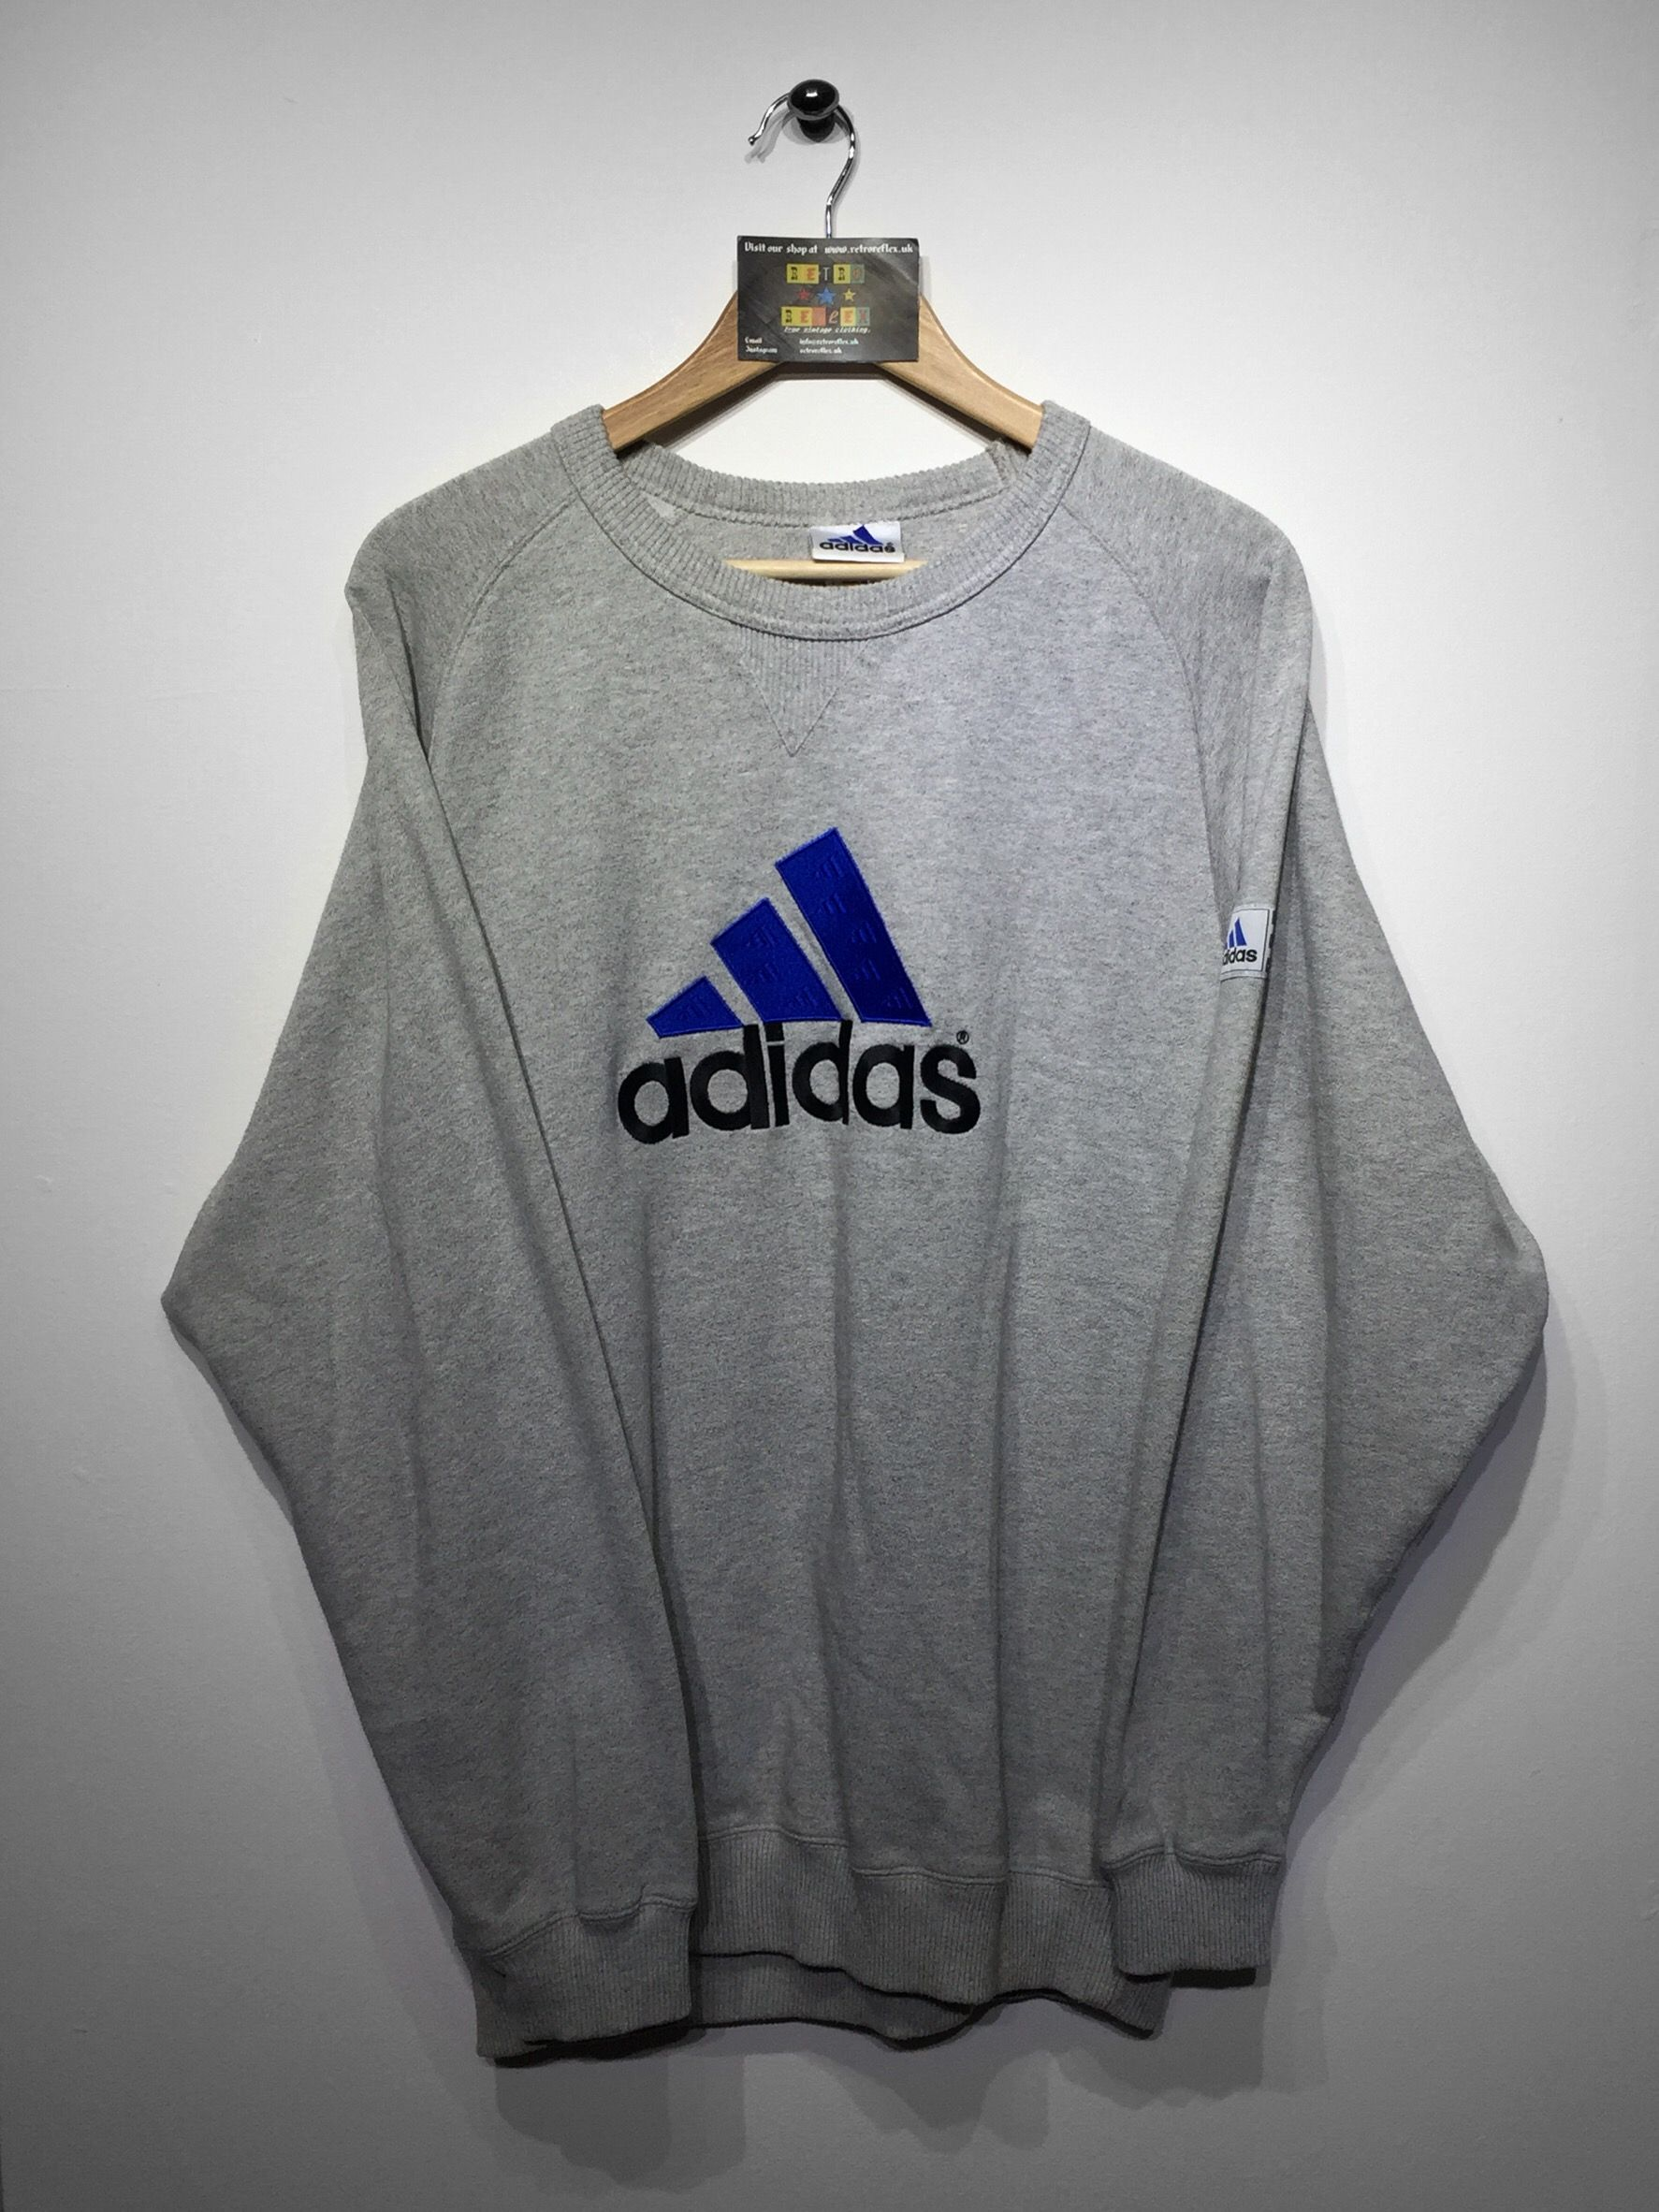 Adidas Sweatshirt size Small (but Fits Baggy Oversized) £34